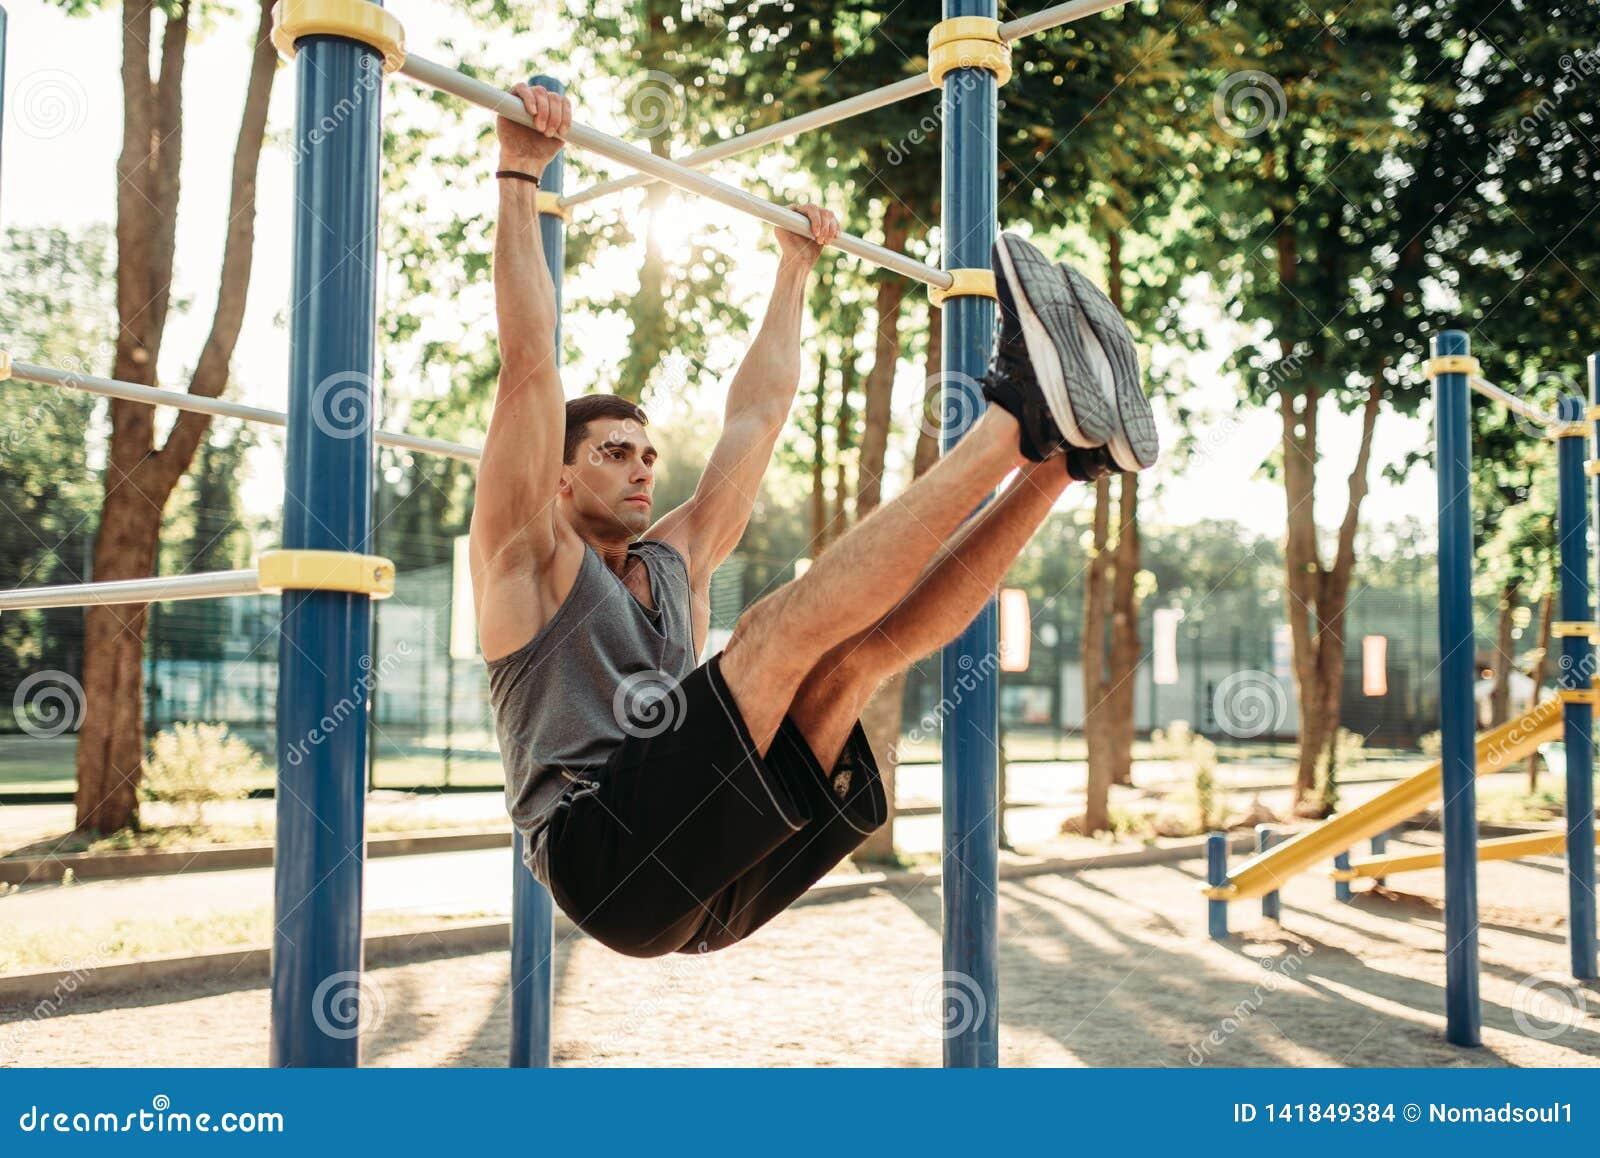 Man doing exercise on press using horizontal bar